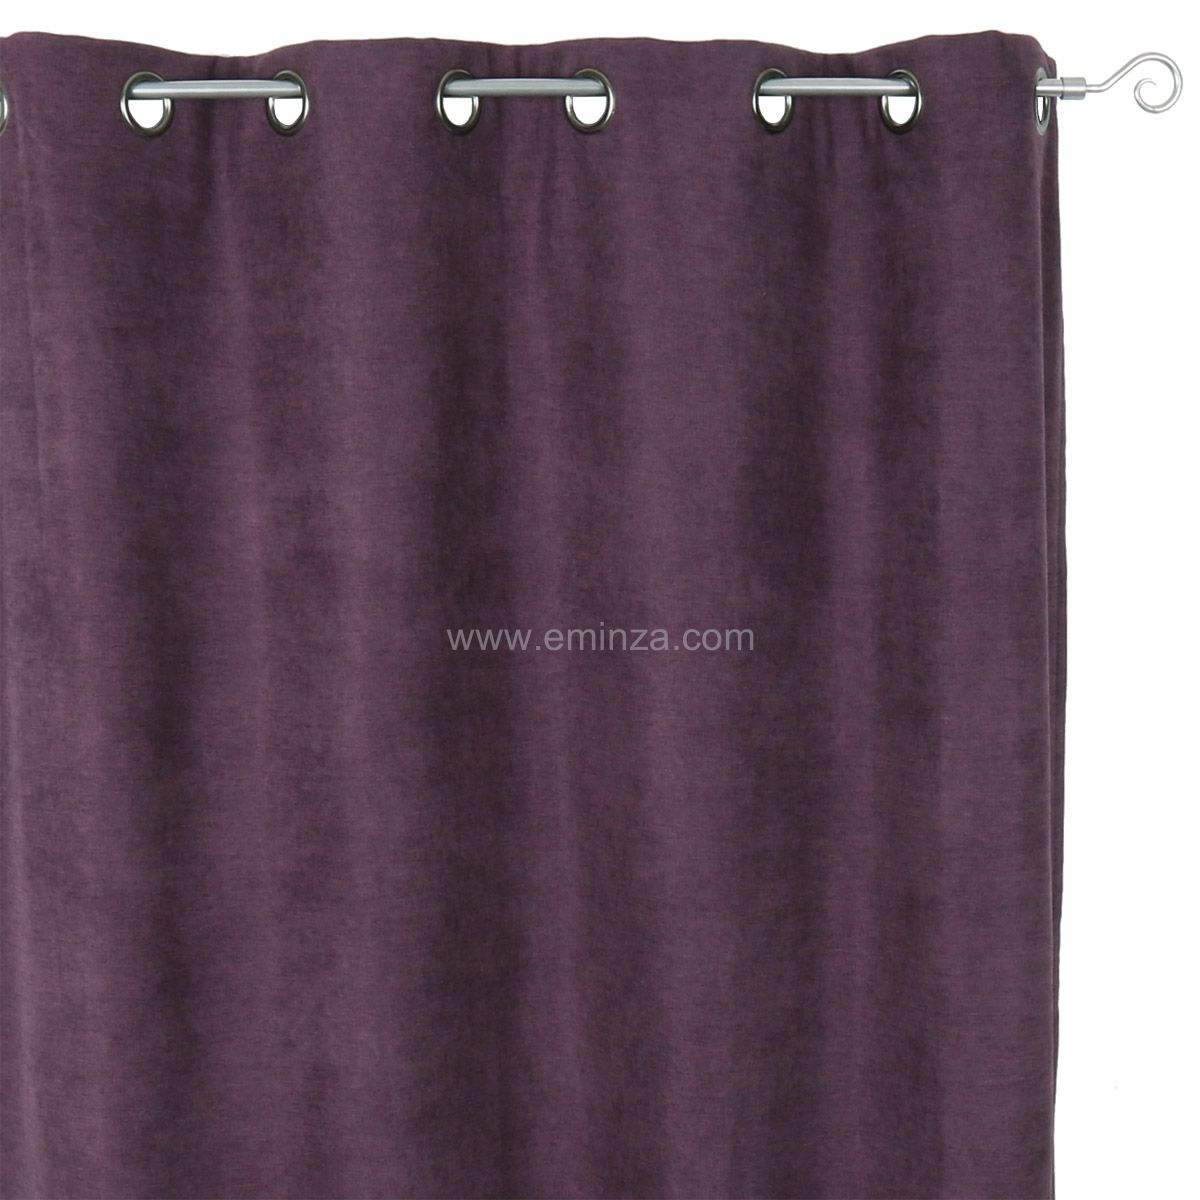 rideau occultant et isolant thermique top rideau. Black Bedroom Furniture Sets. Home Design Ideas